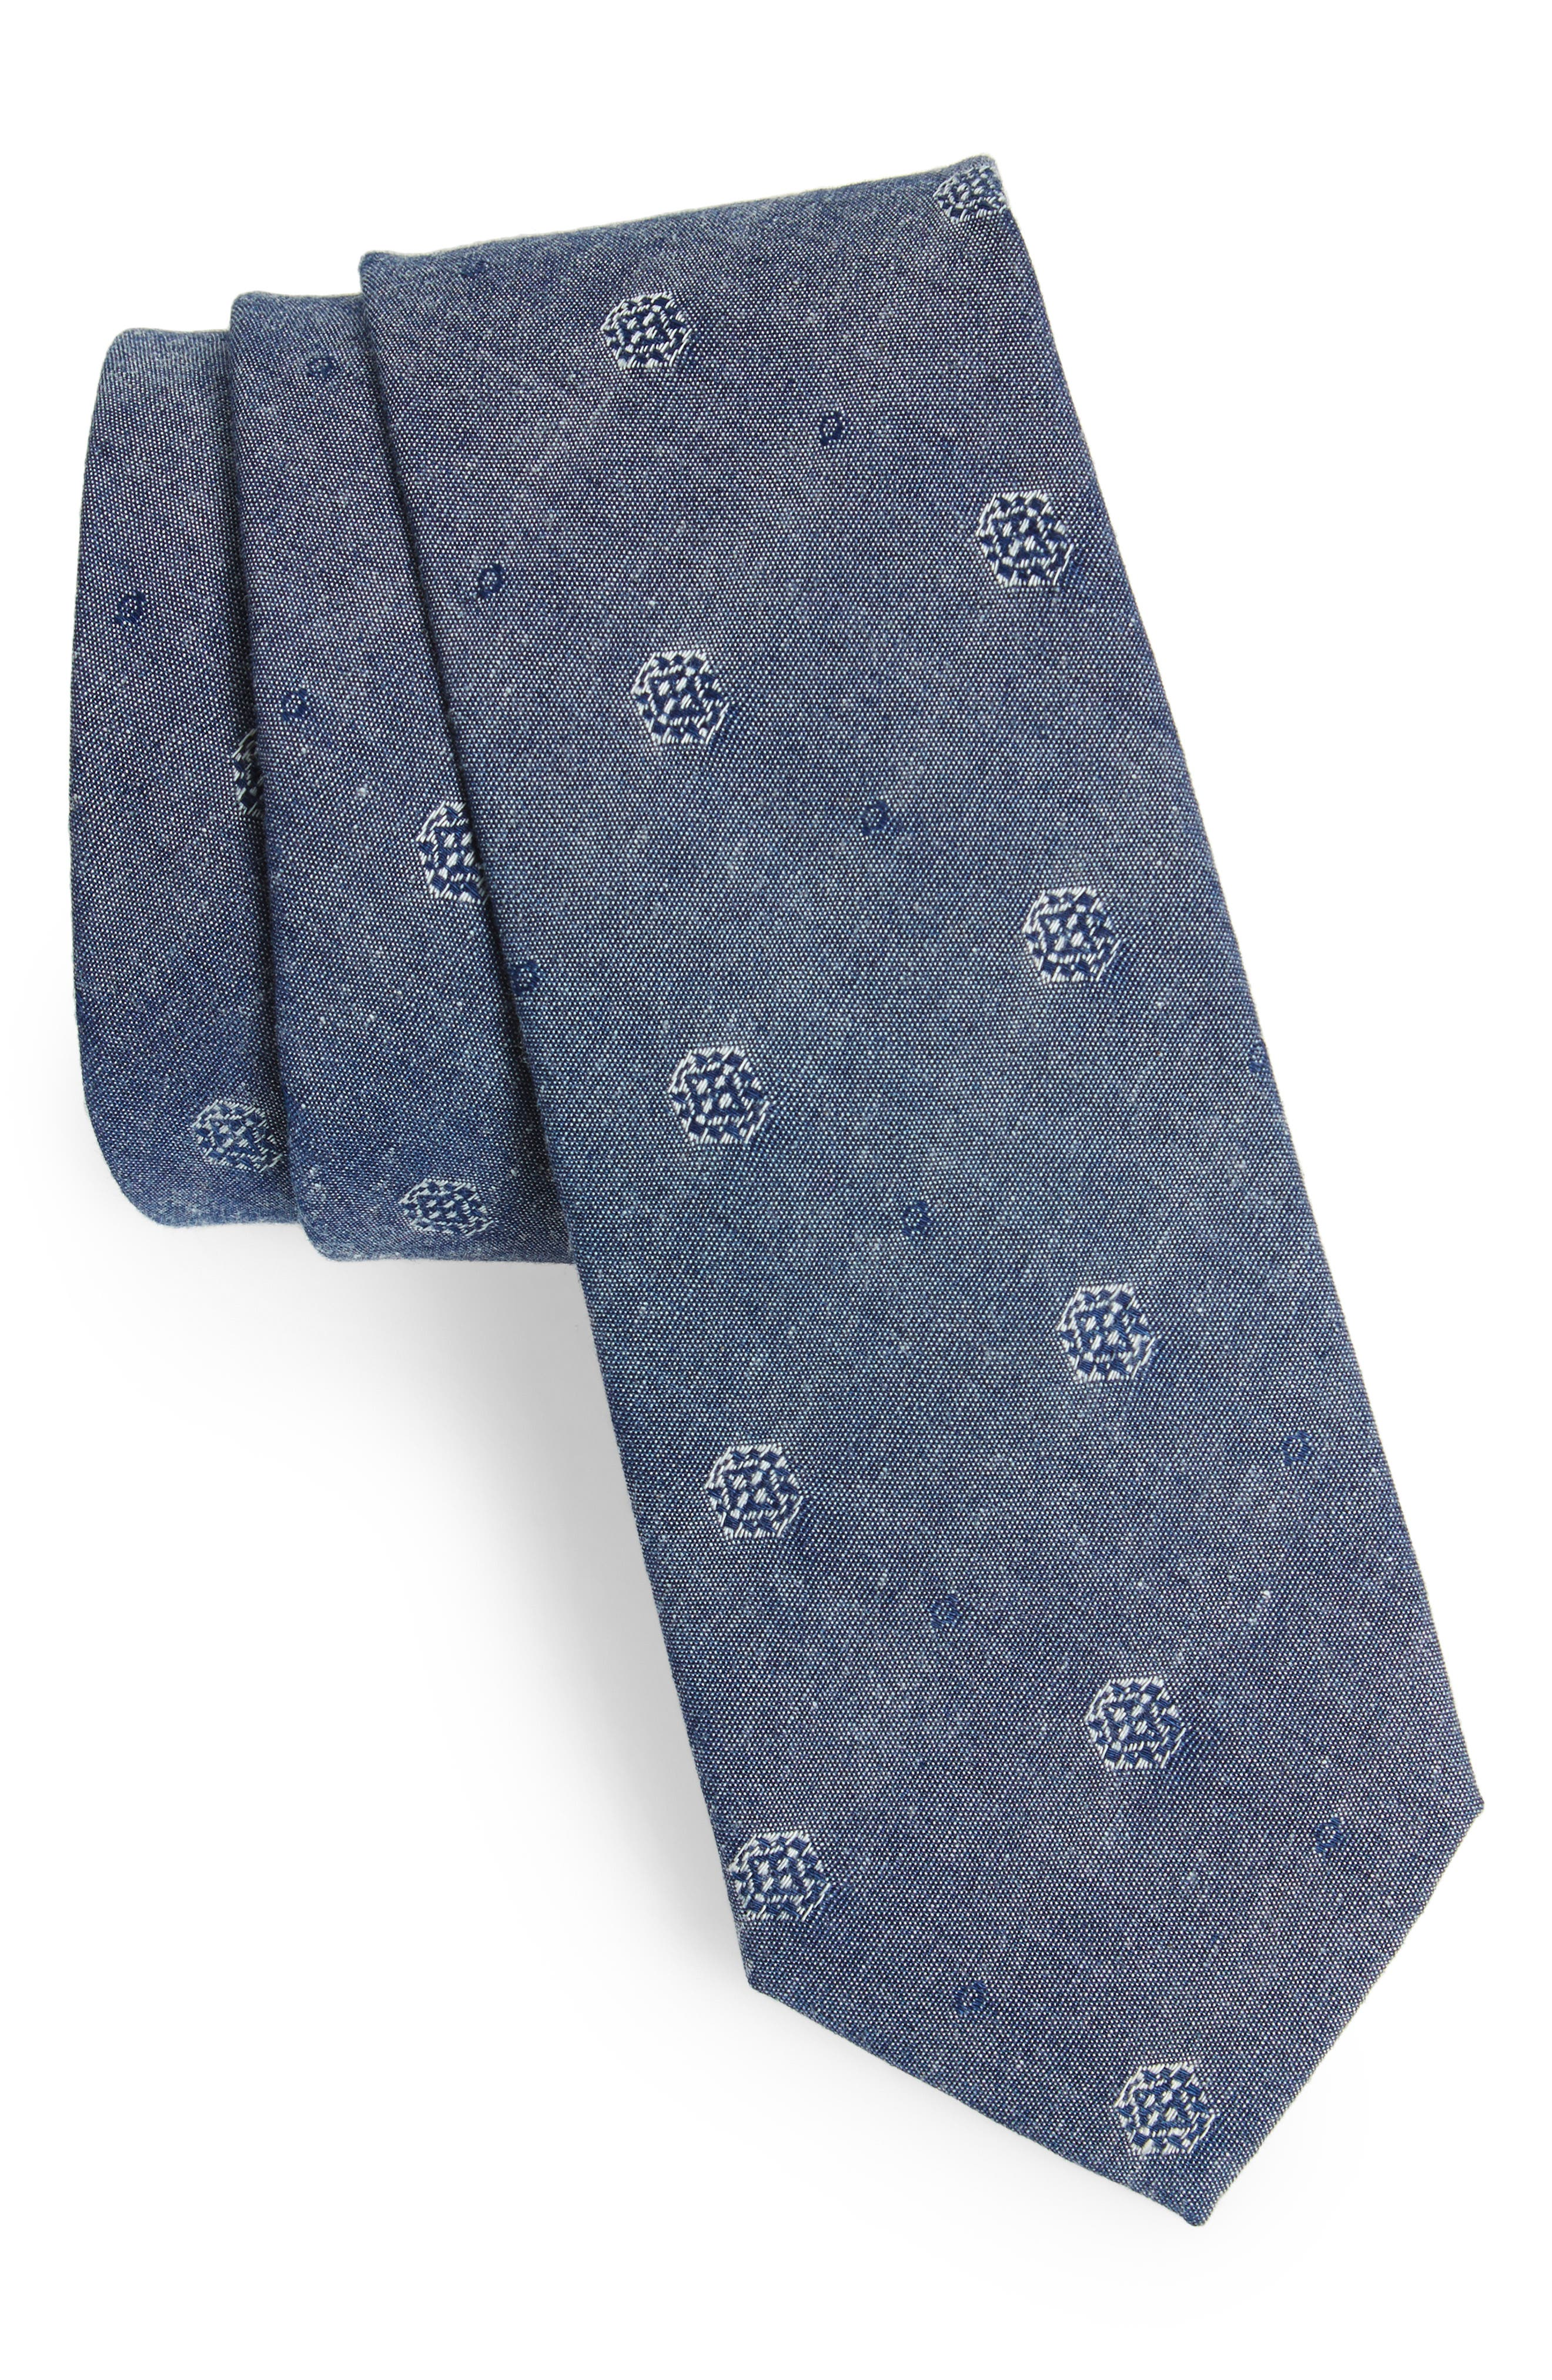 Alternate Image 1 Selected - Nordstrom Men's Shop Medallion Cotton Tie